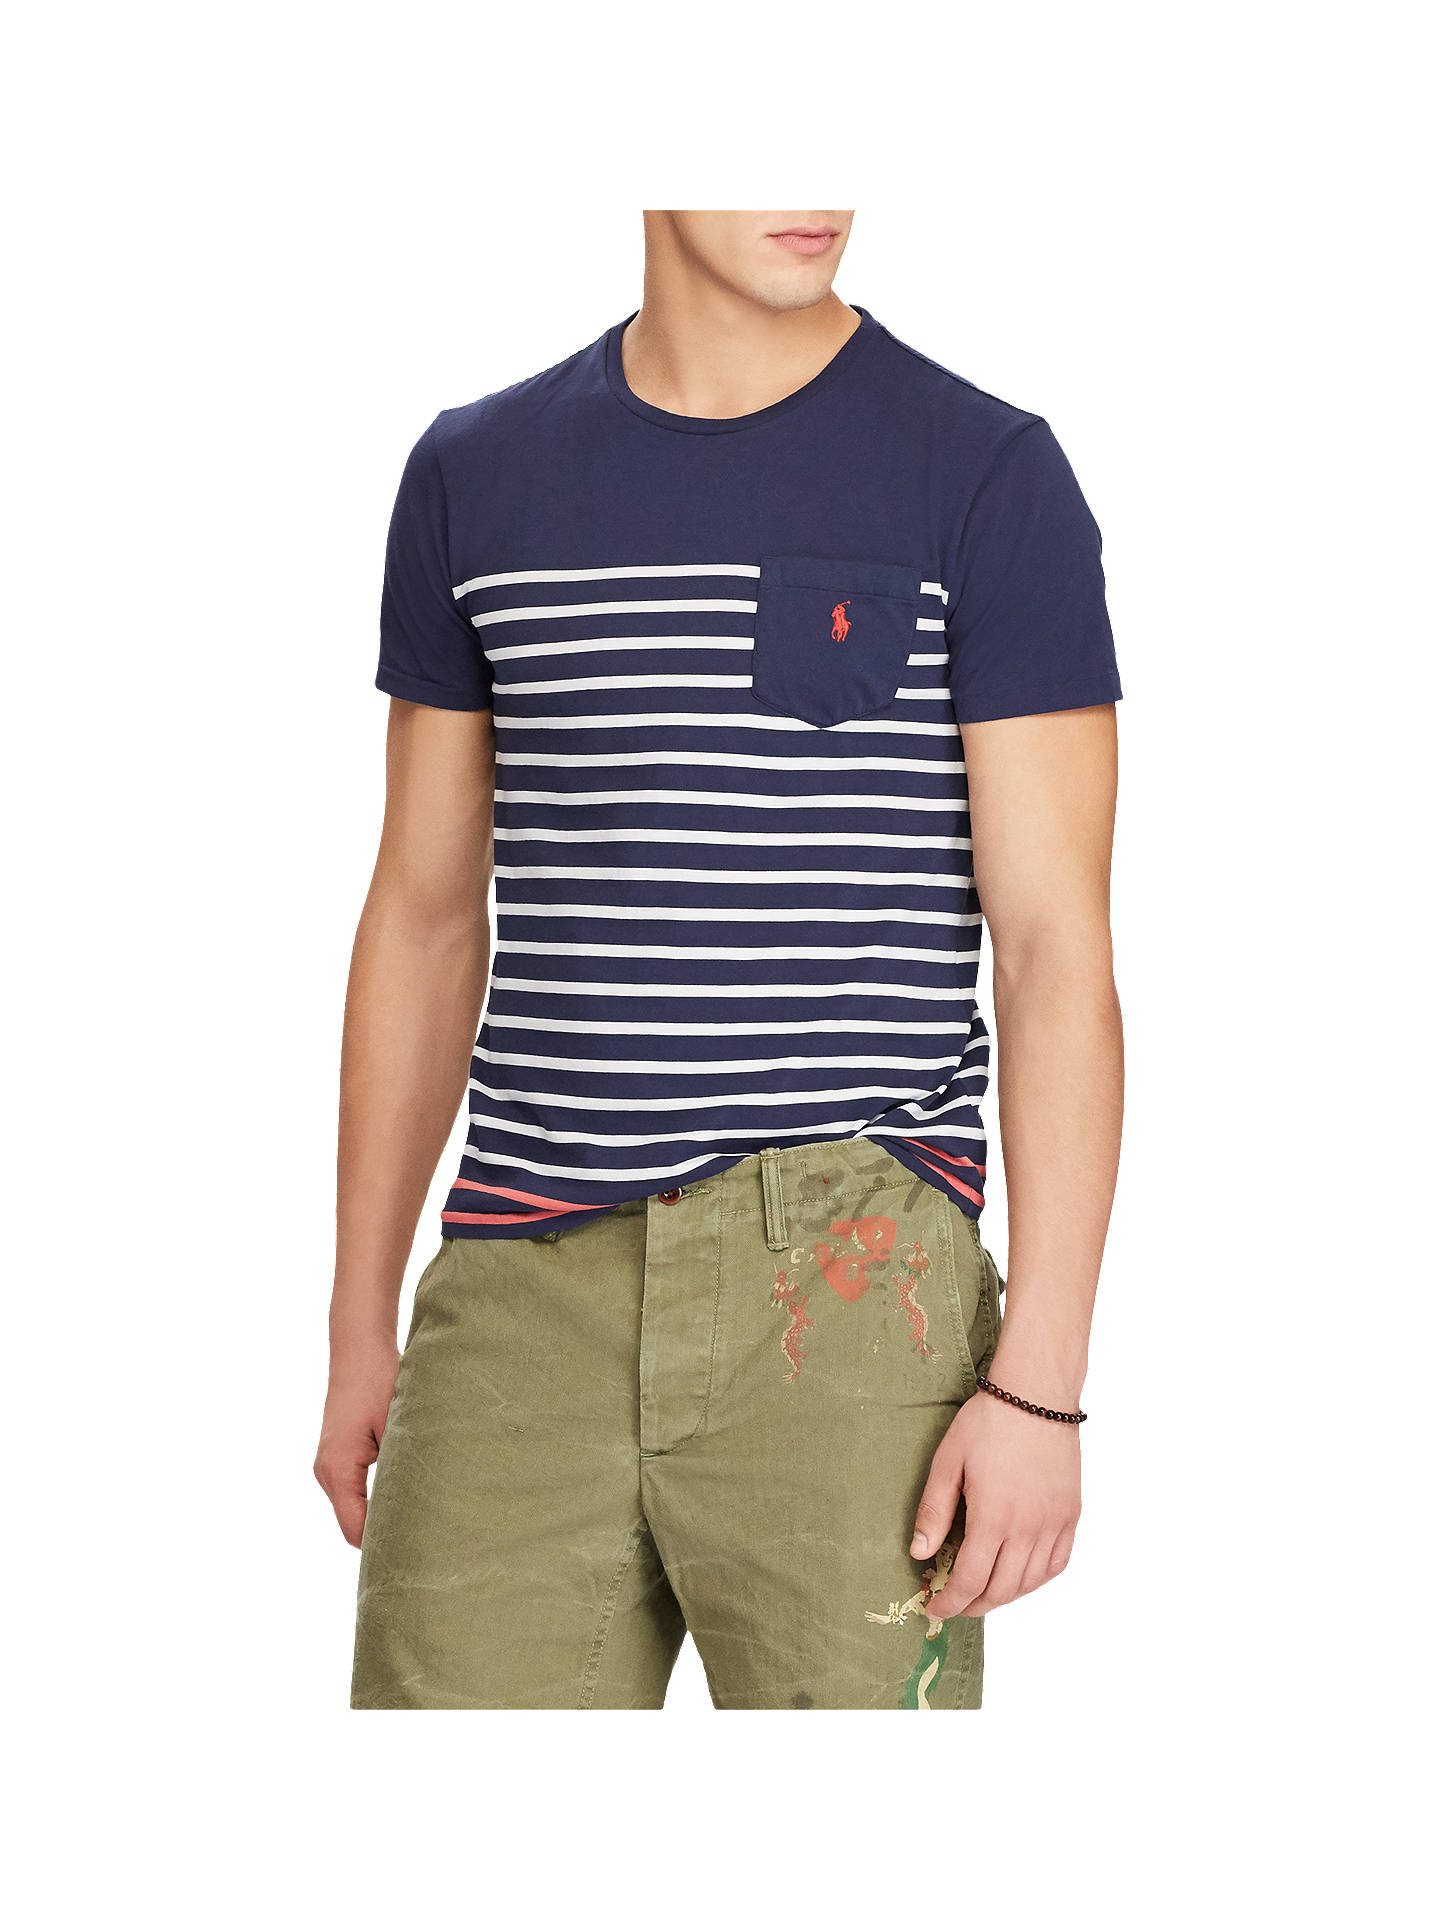 ab2f773e4f650 Polo Ralph Lauren Yarn Died Stripe Pocket T-Shirt at John Lewis ...